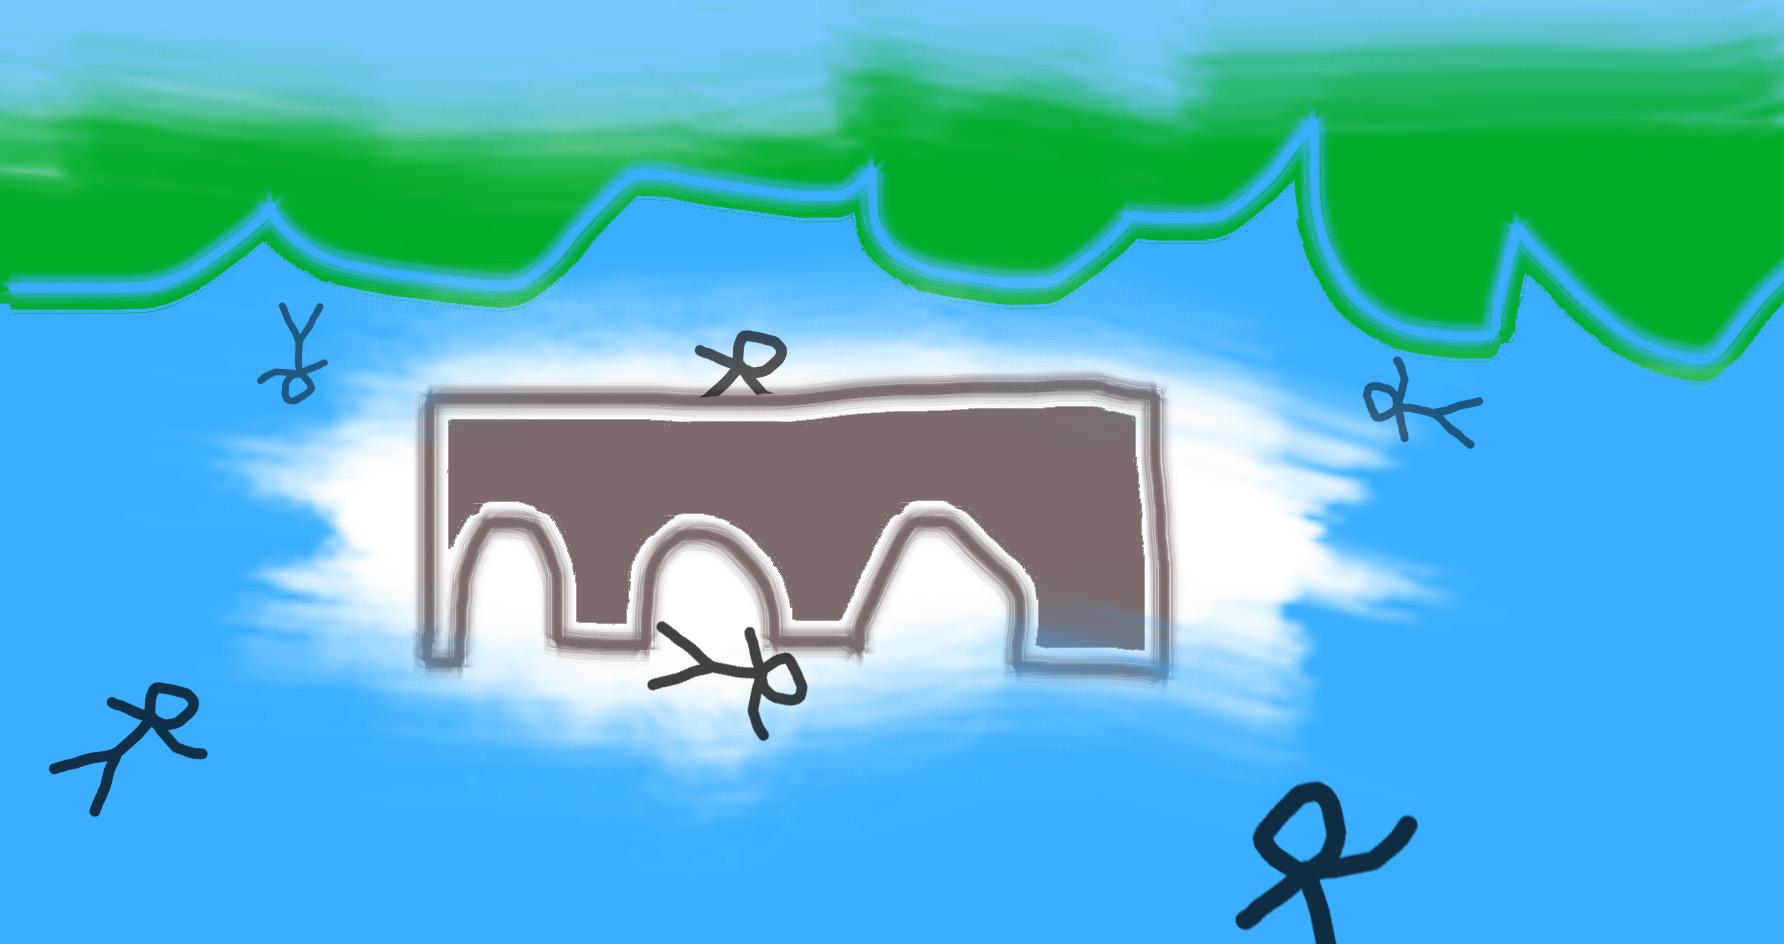 bridgeunderthewater